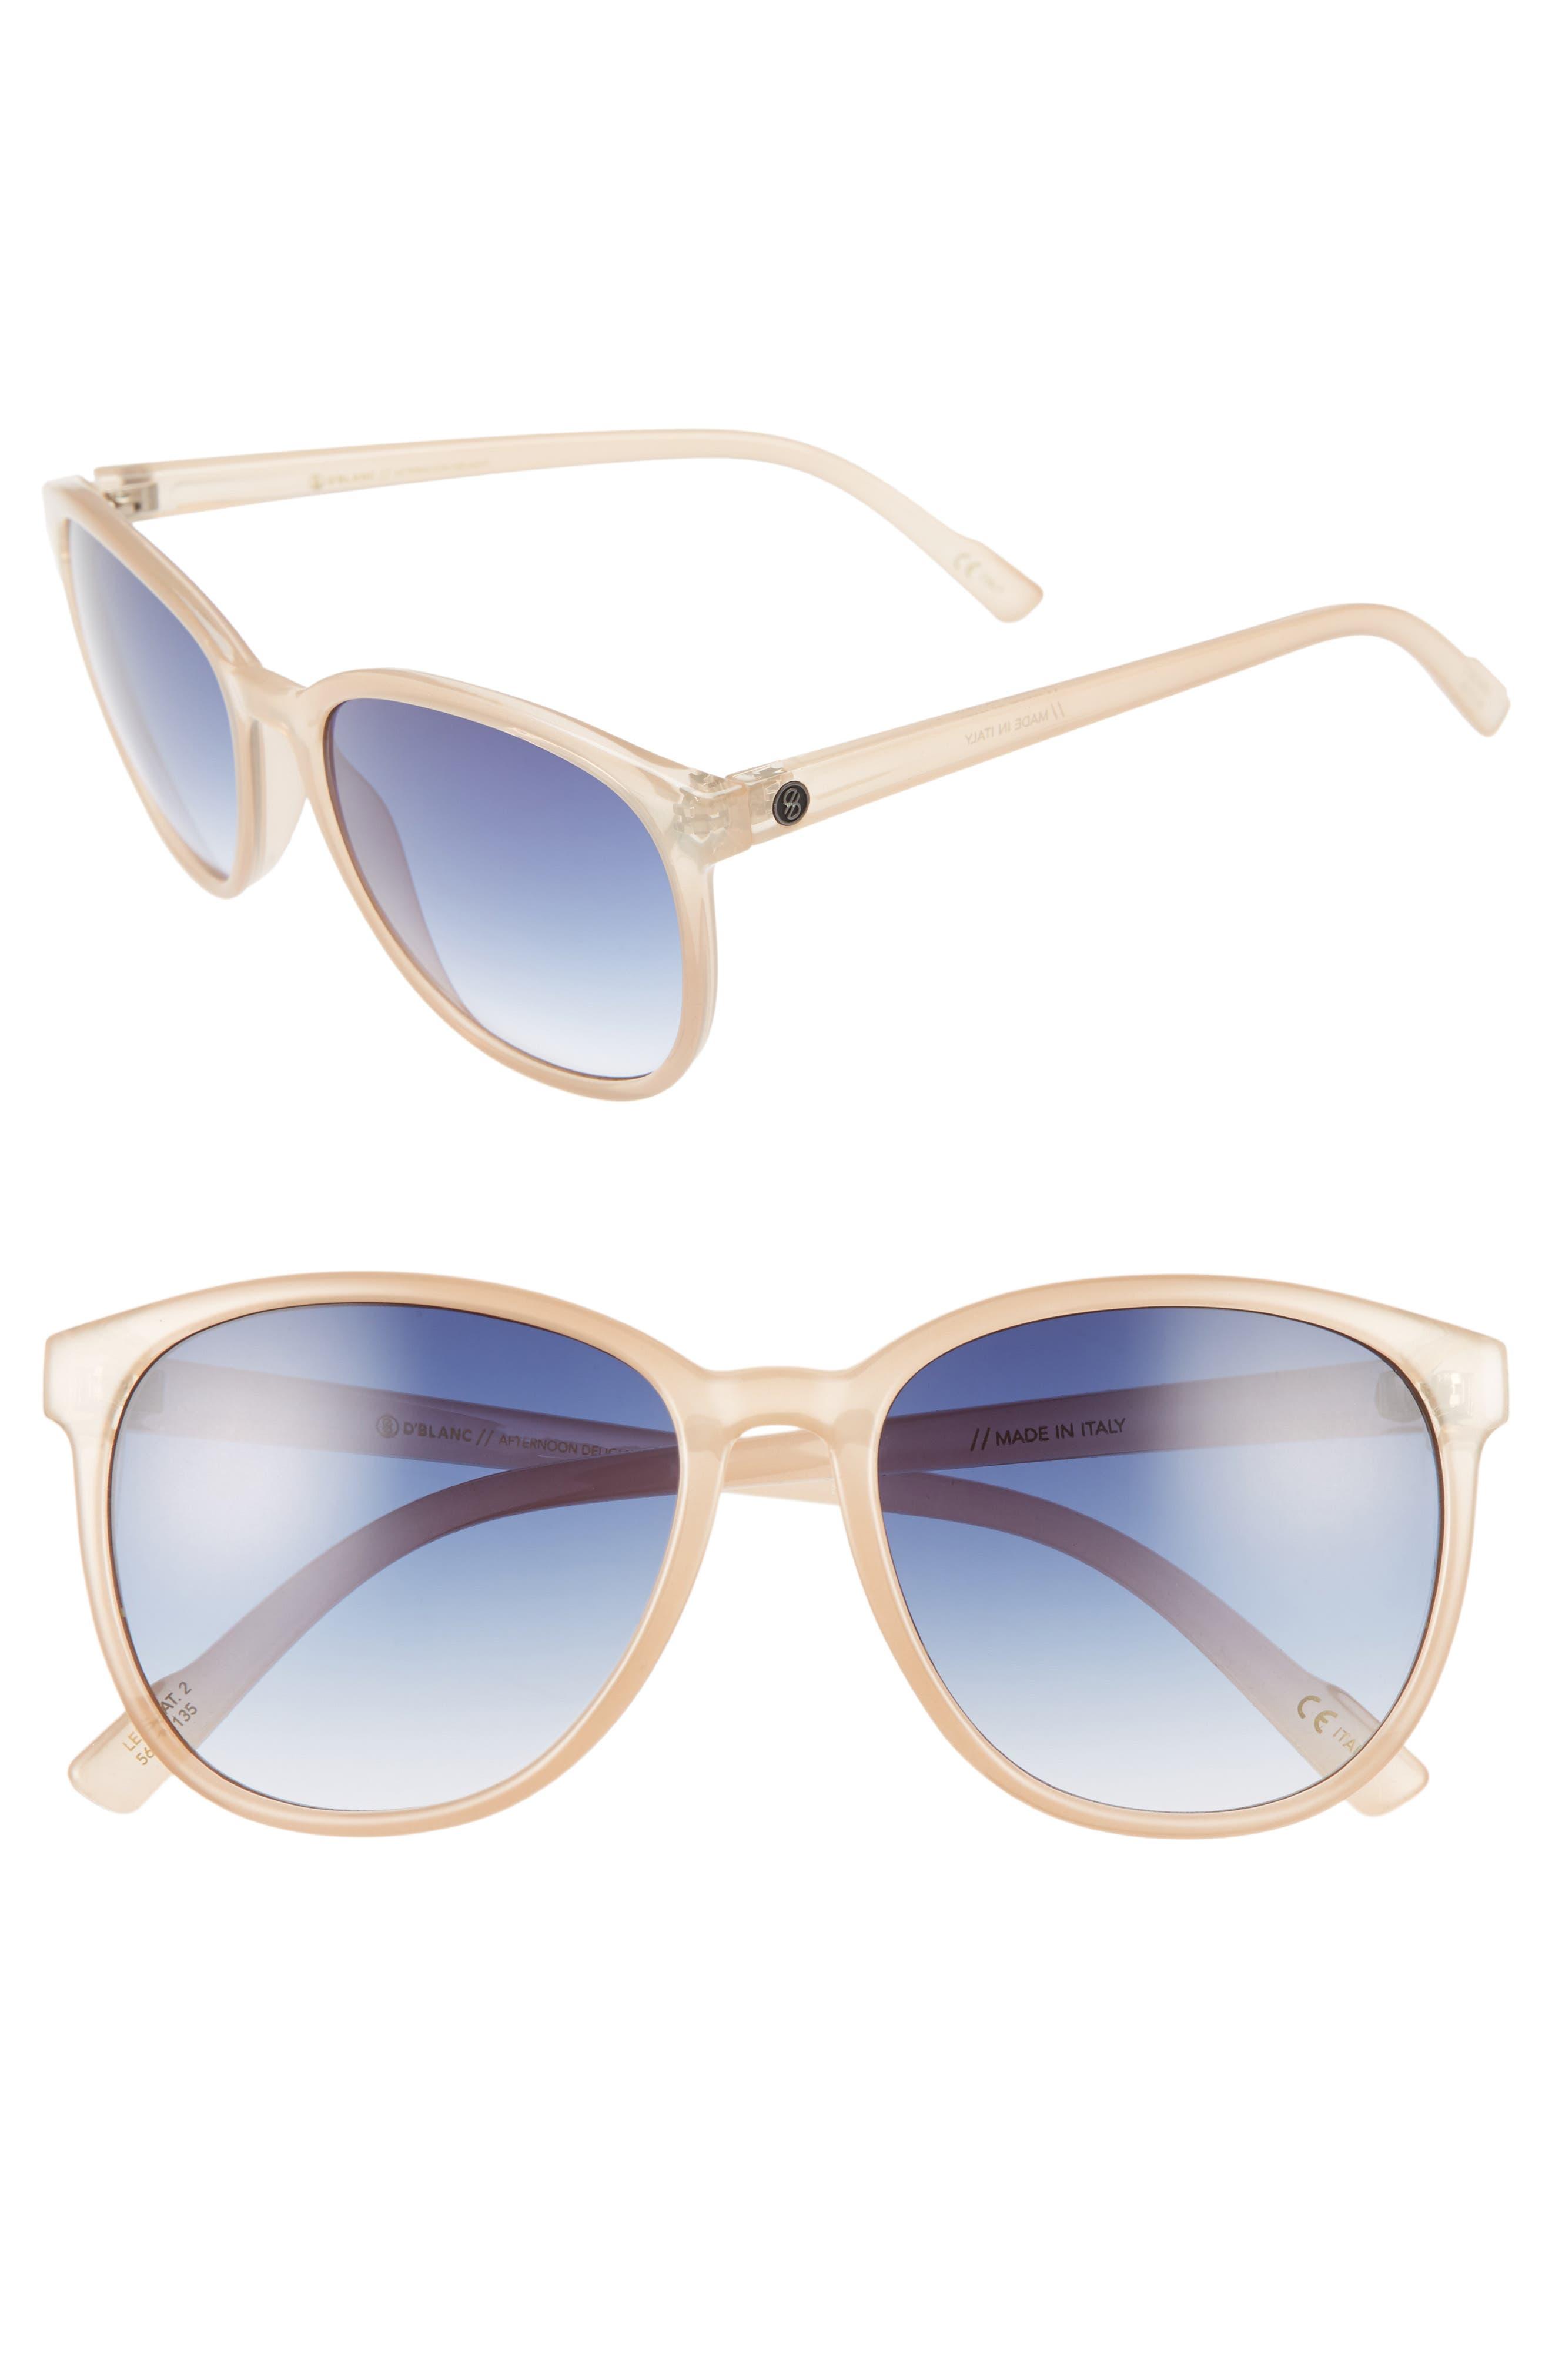 D'BLANC Afternoon Delight 56mm Gradient Lens Sunglasses